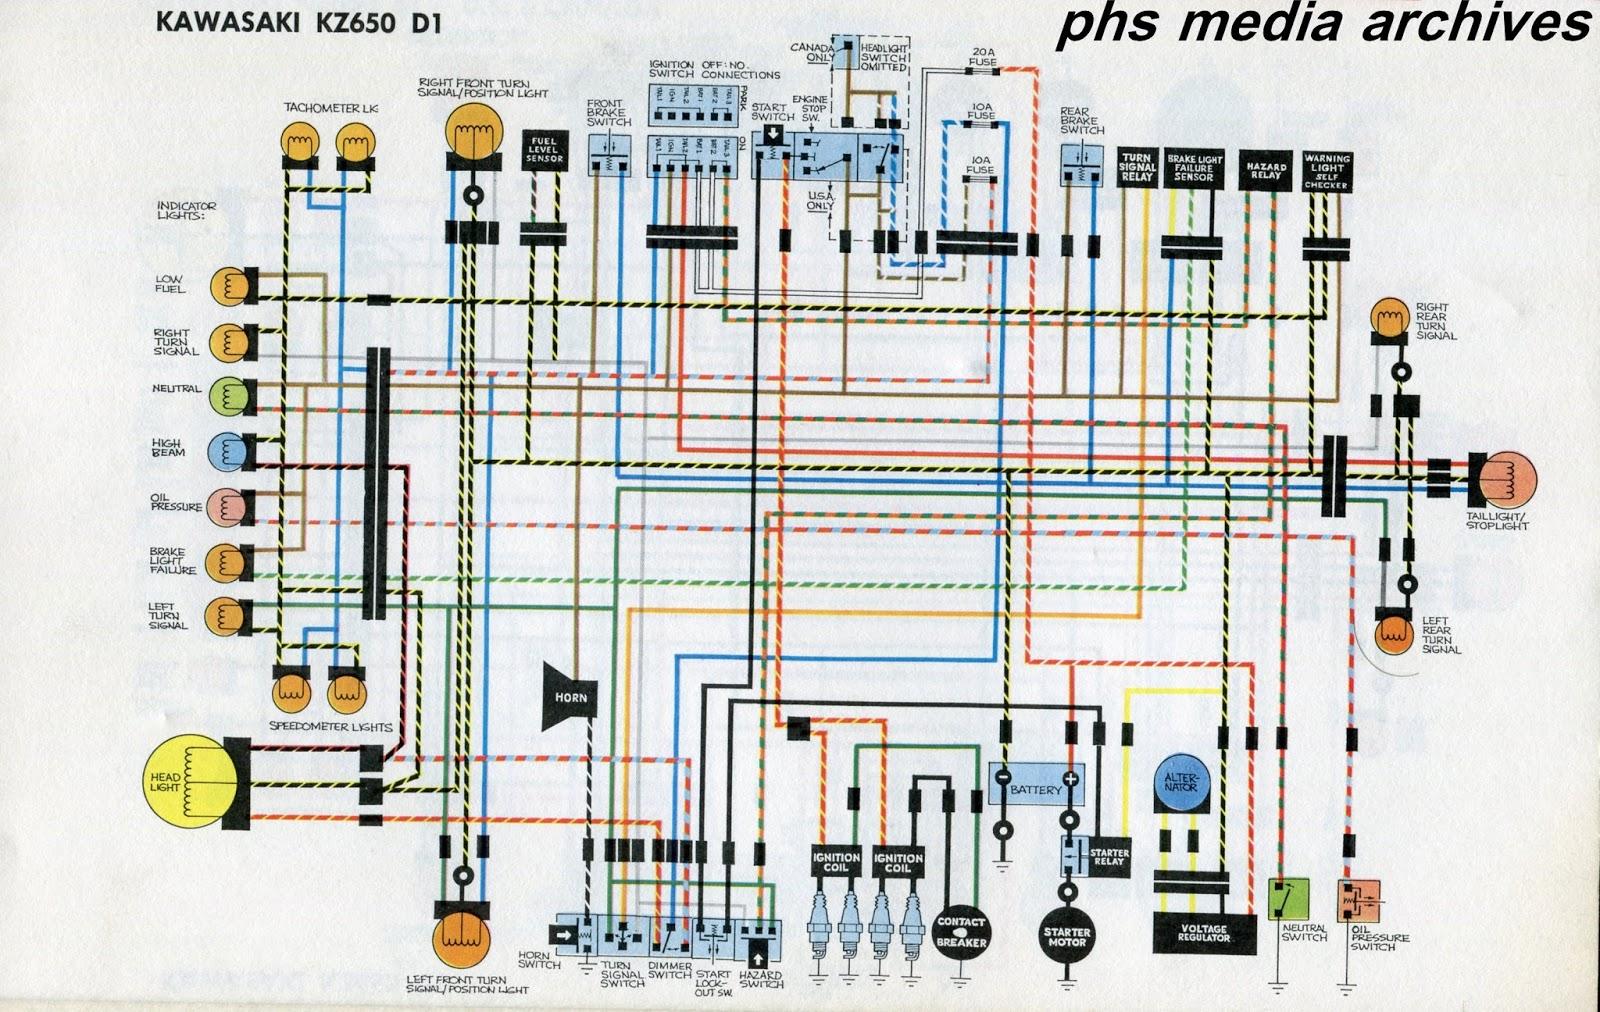 hight resolution of bobber kz650 wiring diagram wiring diagram advancekz650 wiring diagram wiring diagram bobber kz650 wiring diagram